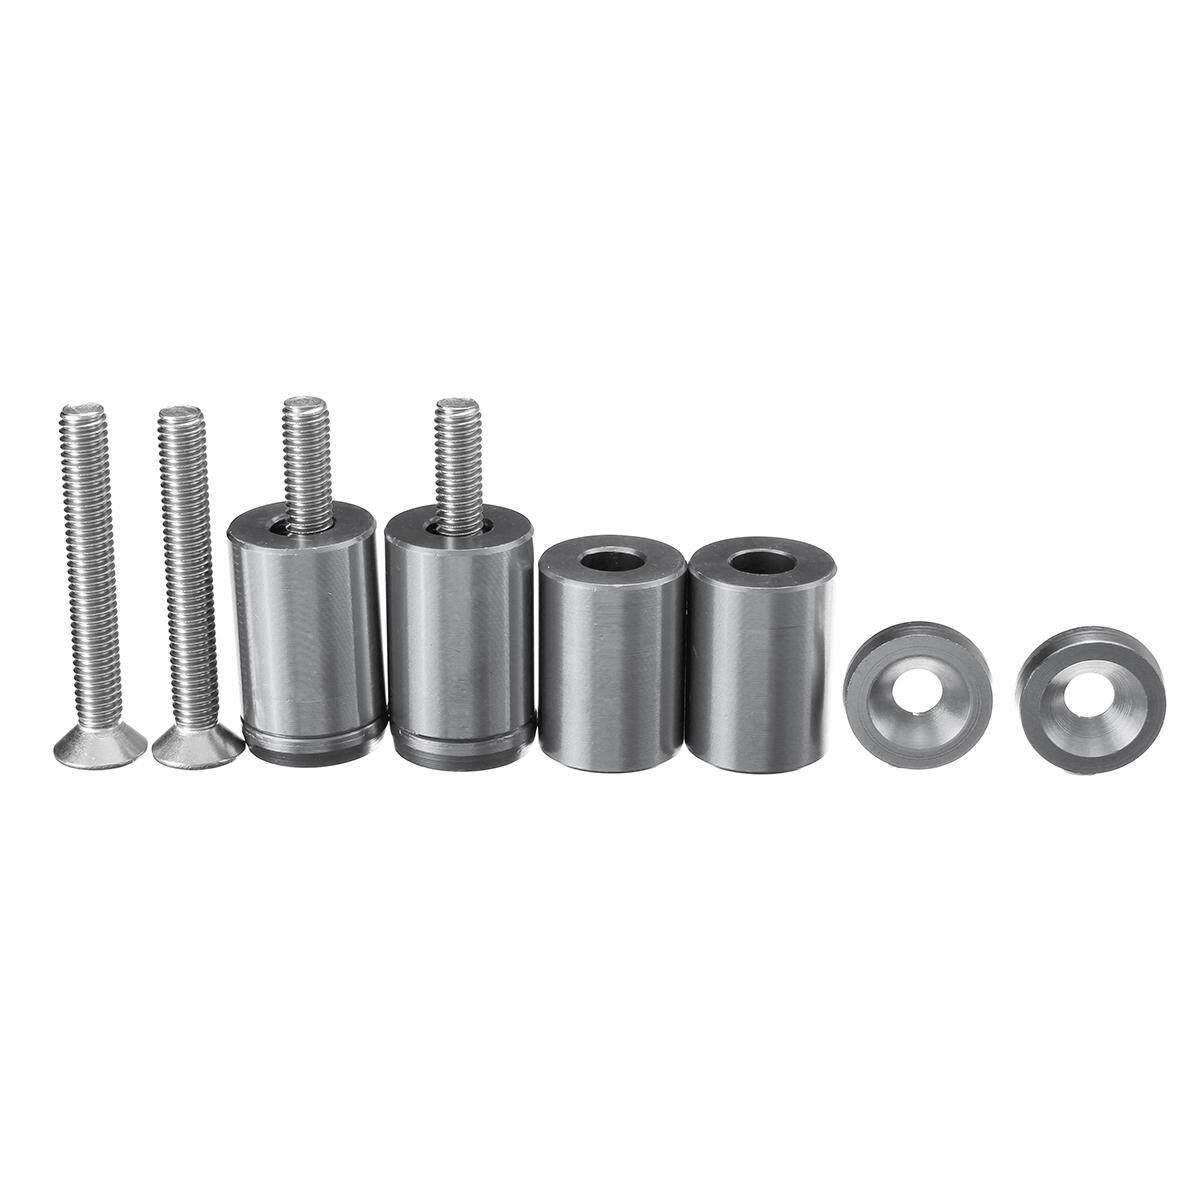 1/'/' 8mm Billet Hood Vent Spacer Riser Kit For Car All Motor Turbo Engine Swap